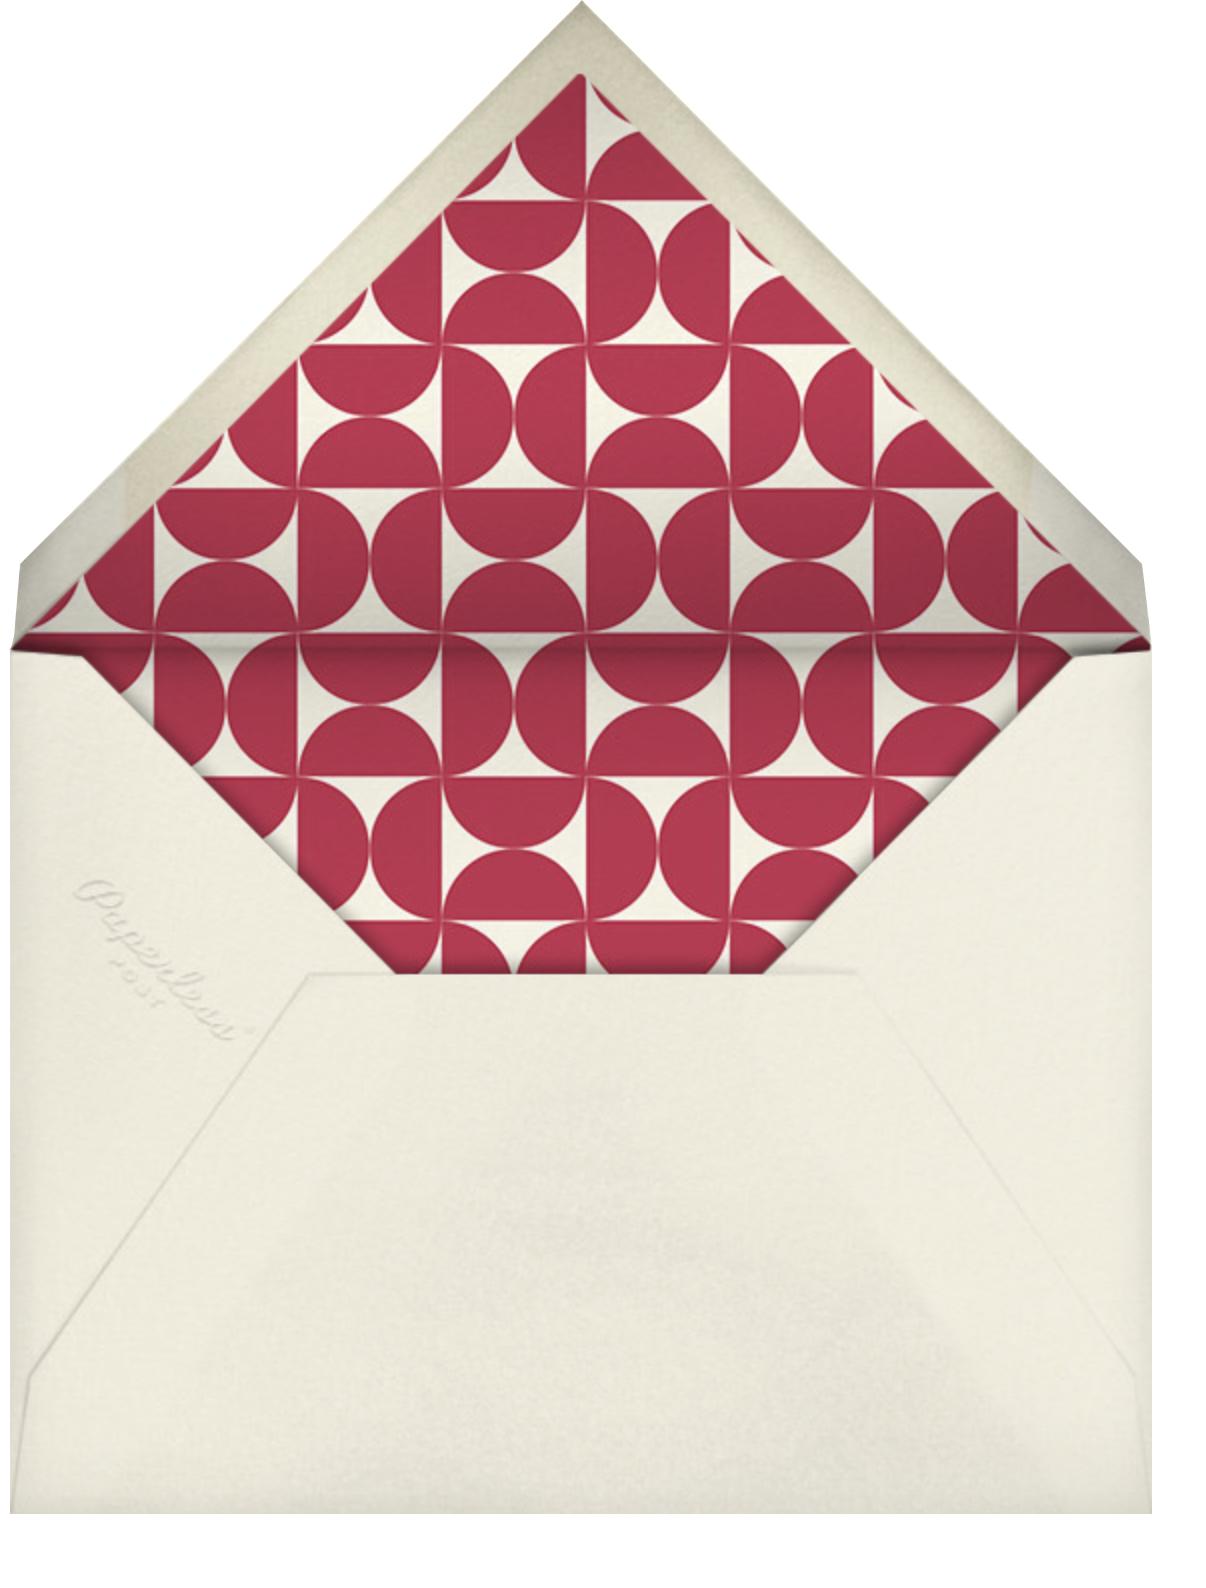 Balanced Hearts - Pink - Paperless Post - Envelope